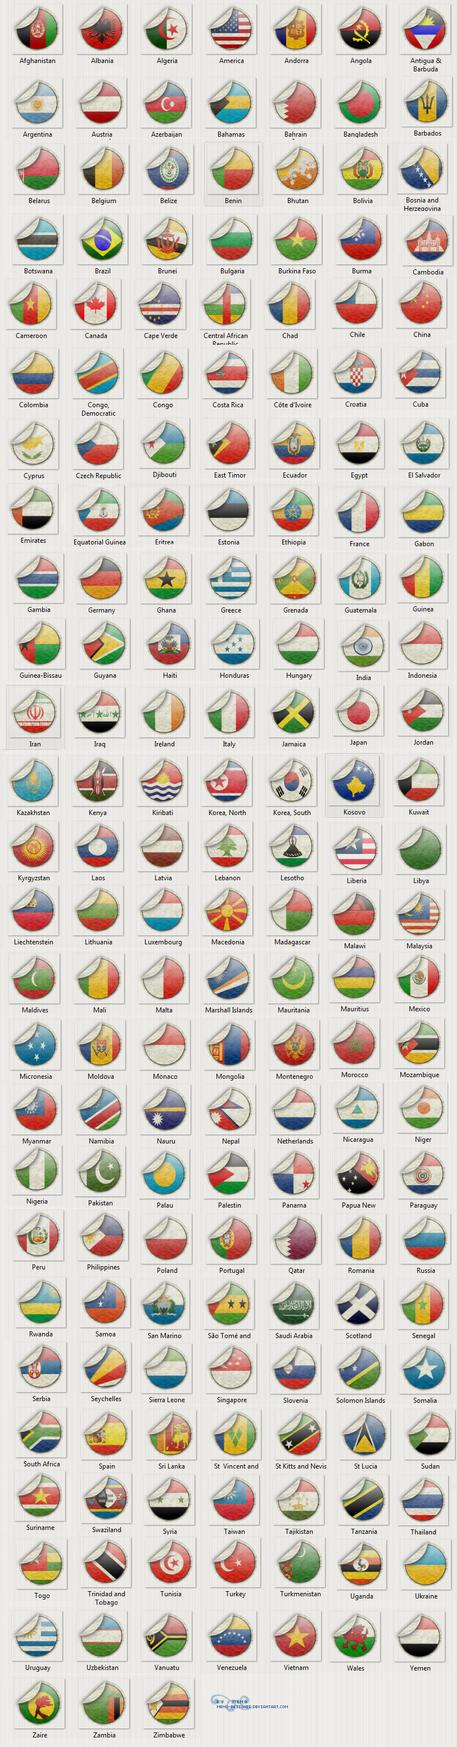 world flags by MEMO-DESIGNER